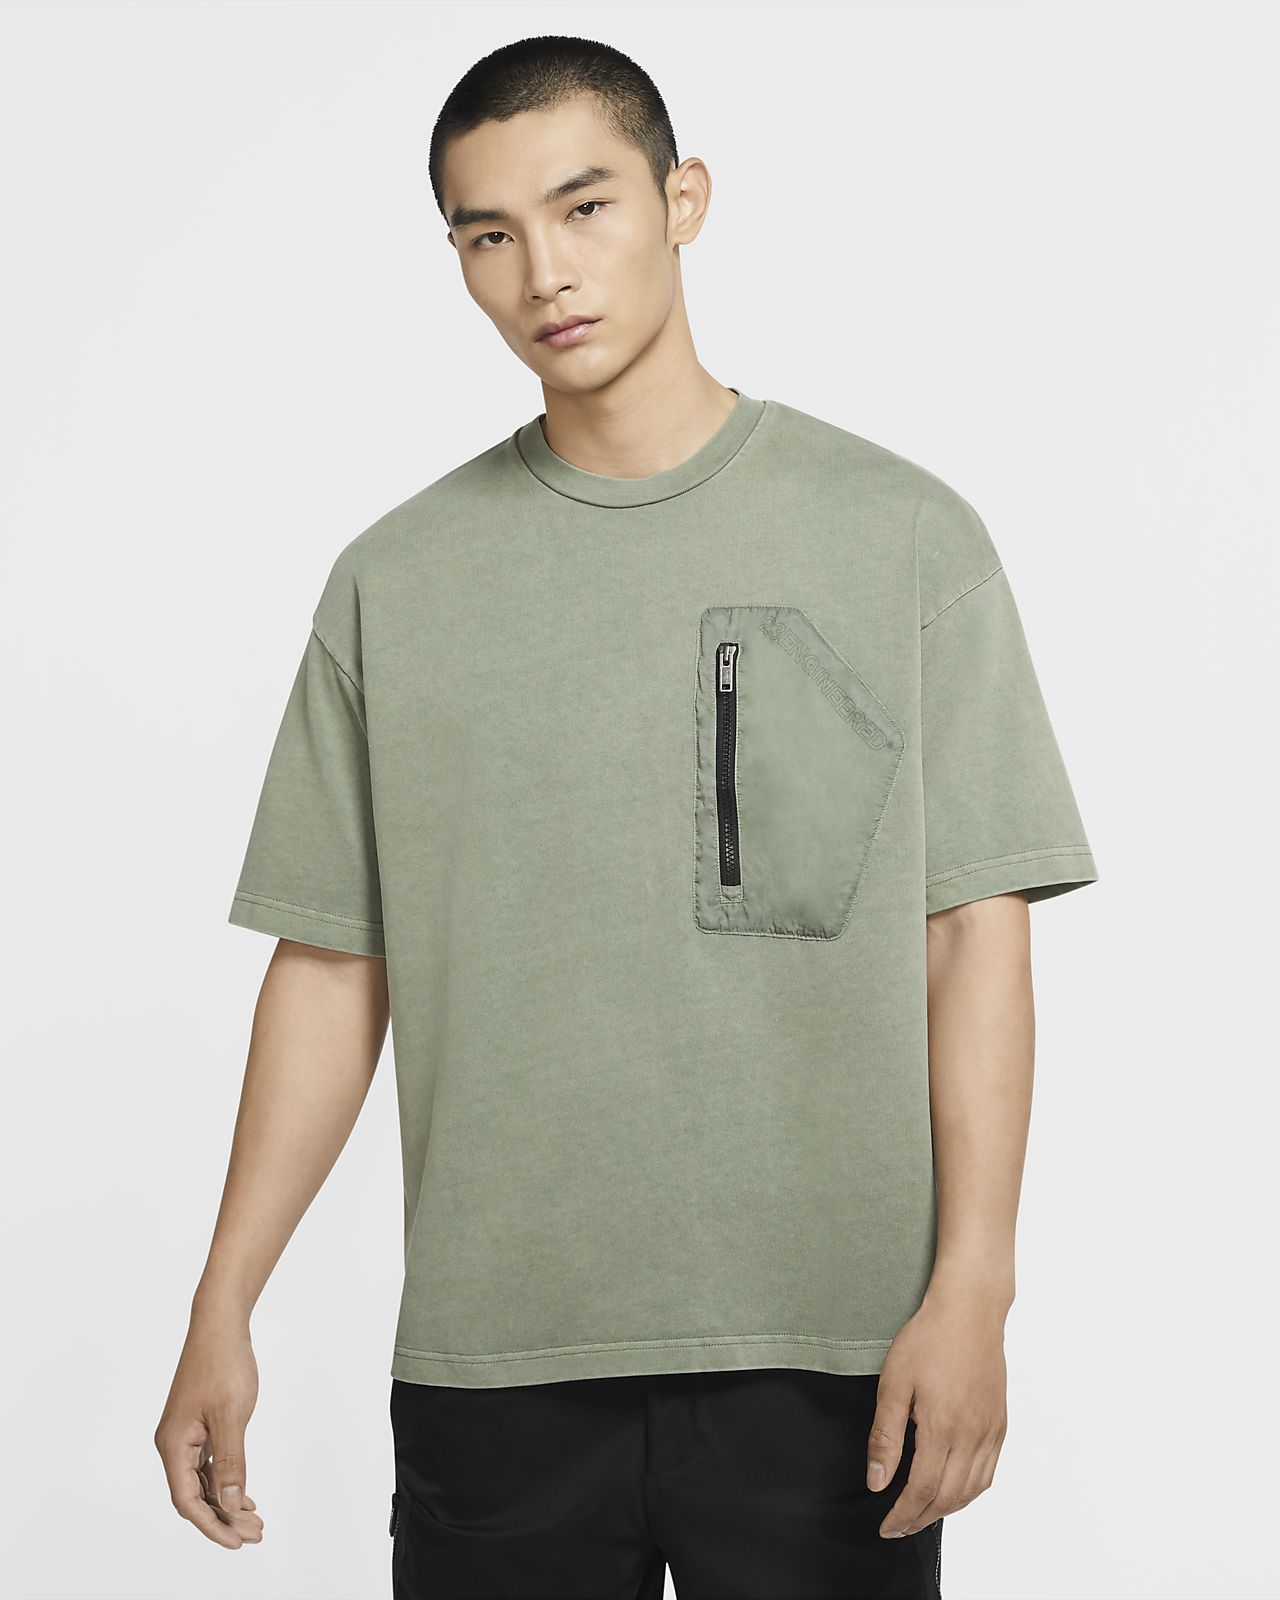 Koszulka męska Jordan 23 Engineered